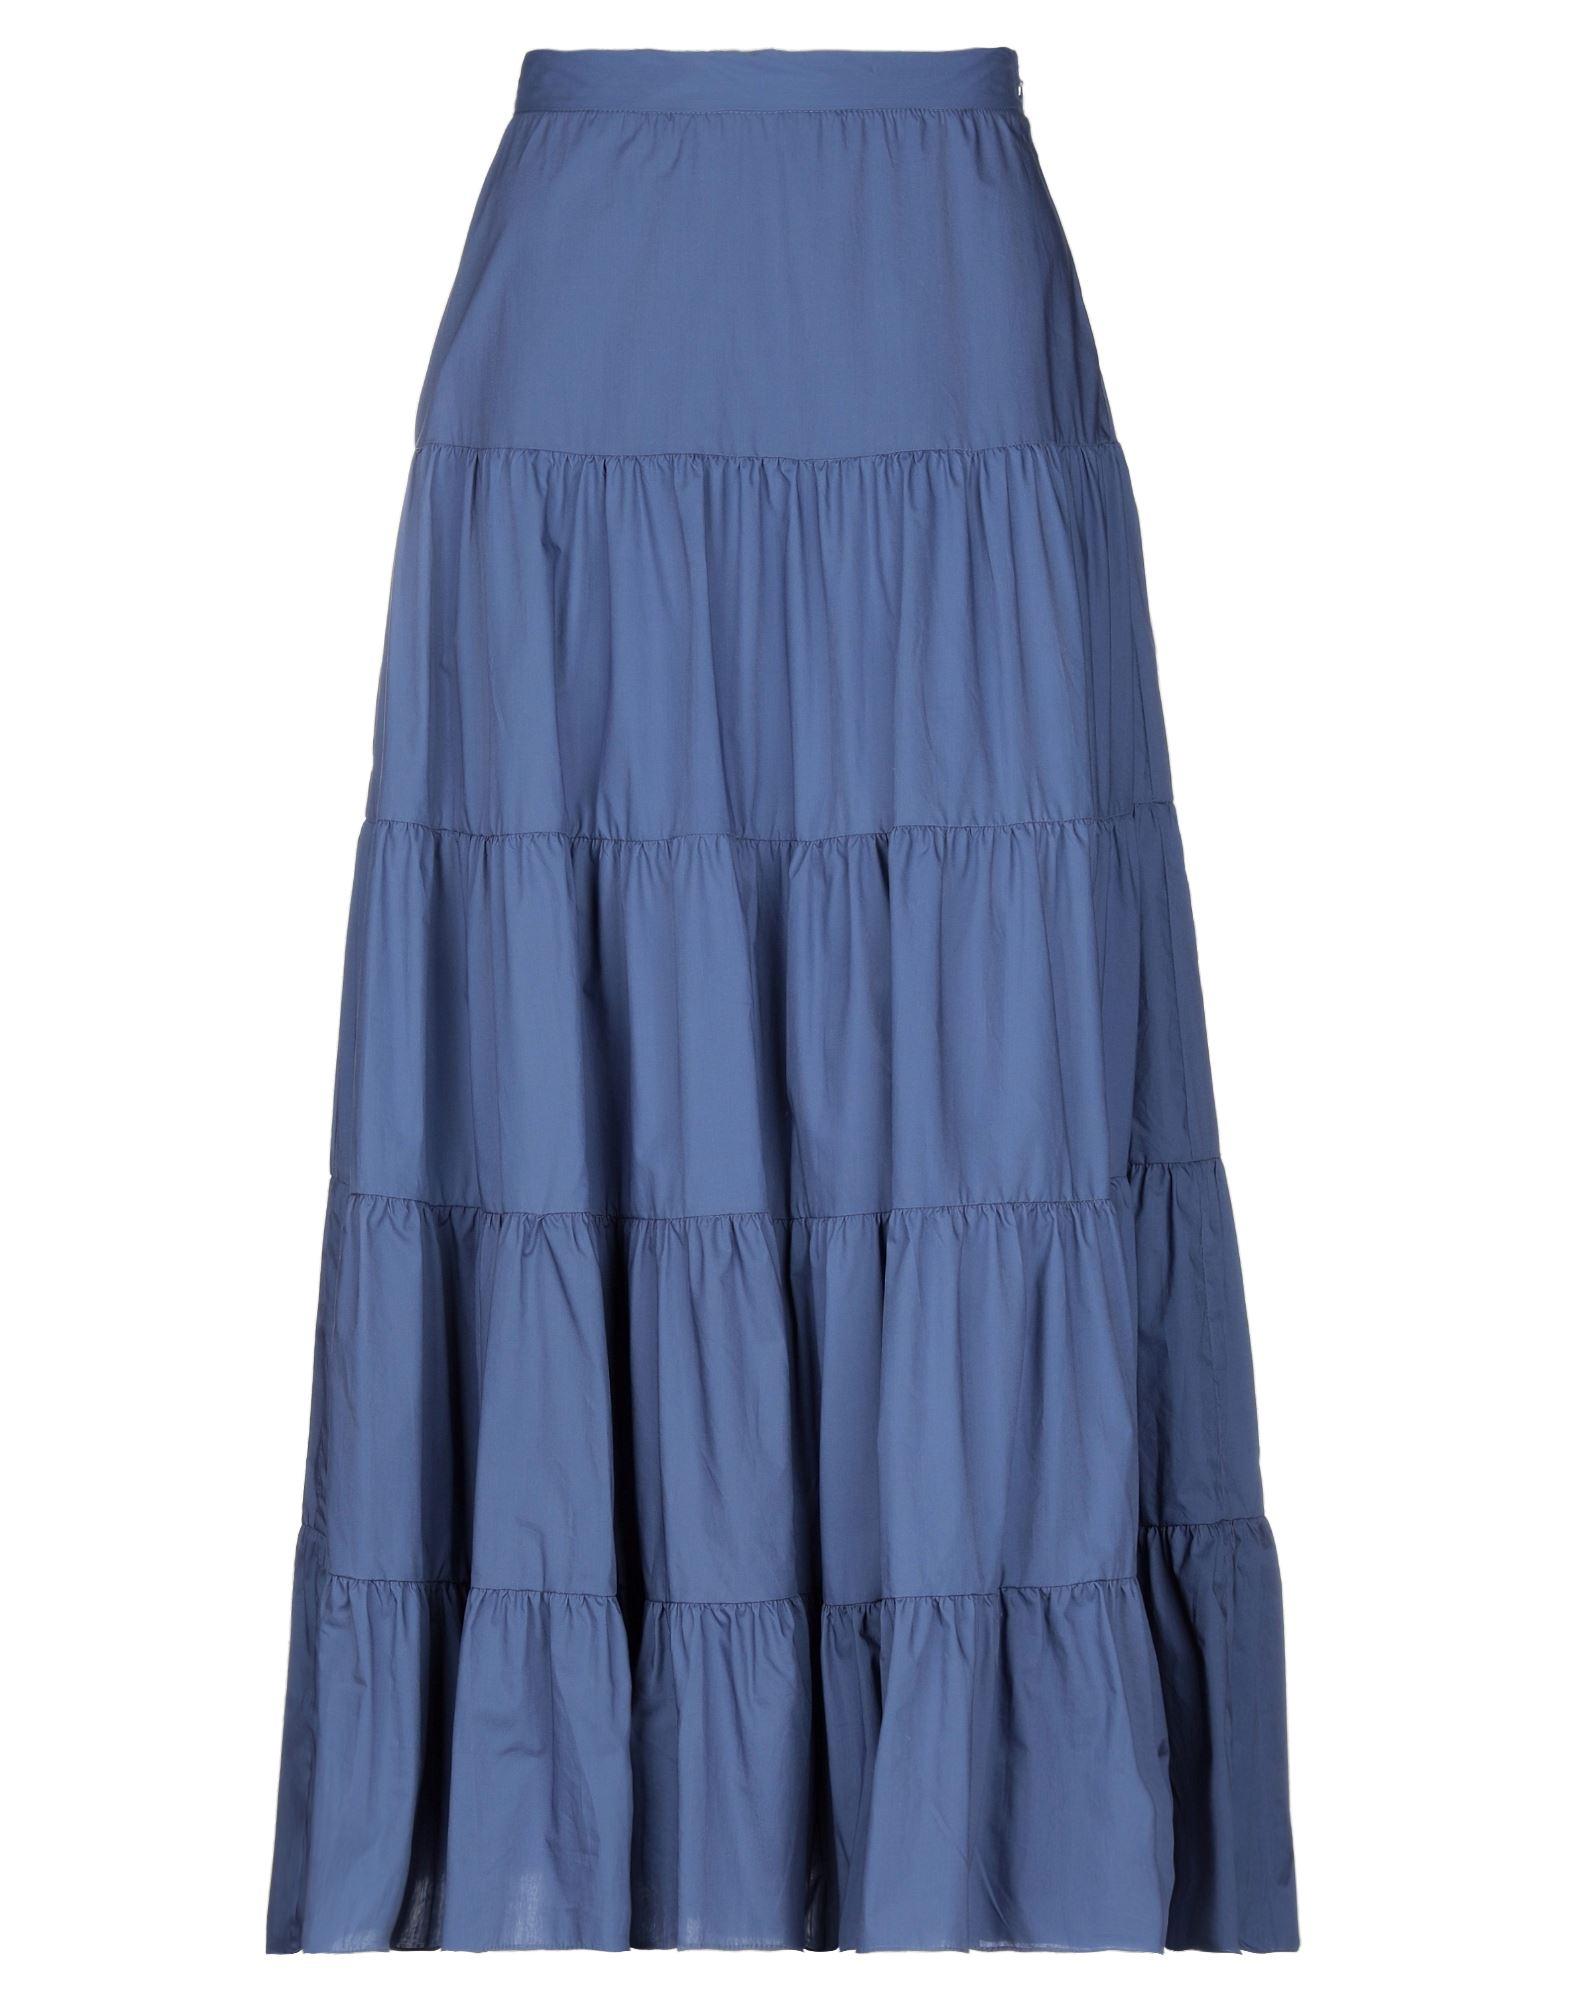 BIANCOGHIACCIO Длинная юбка biancoghiaccio мини юбка